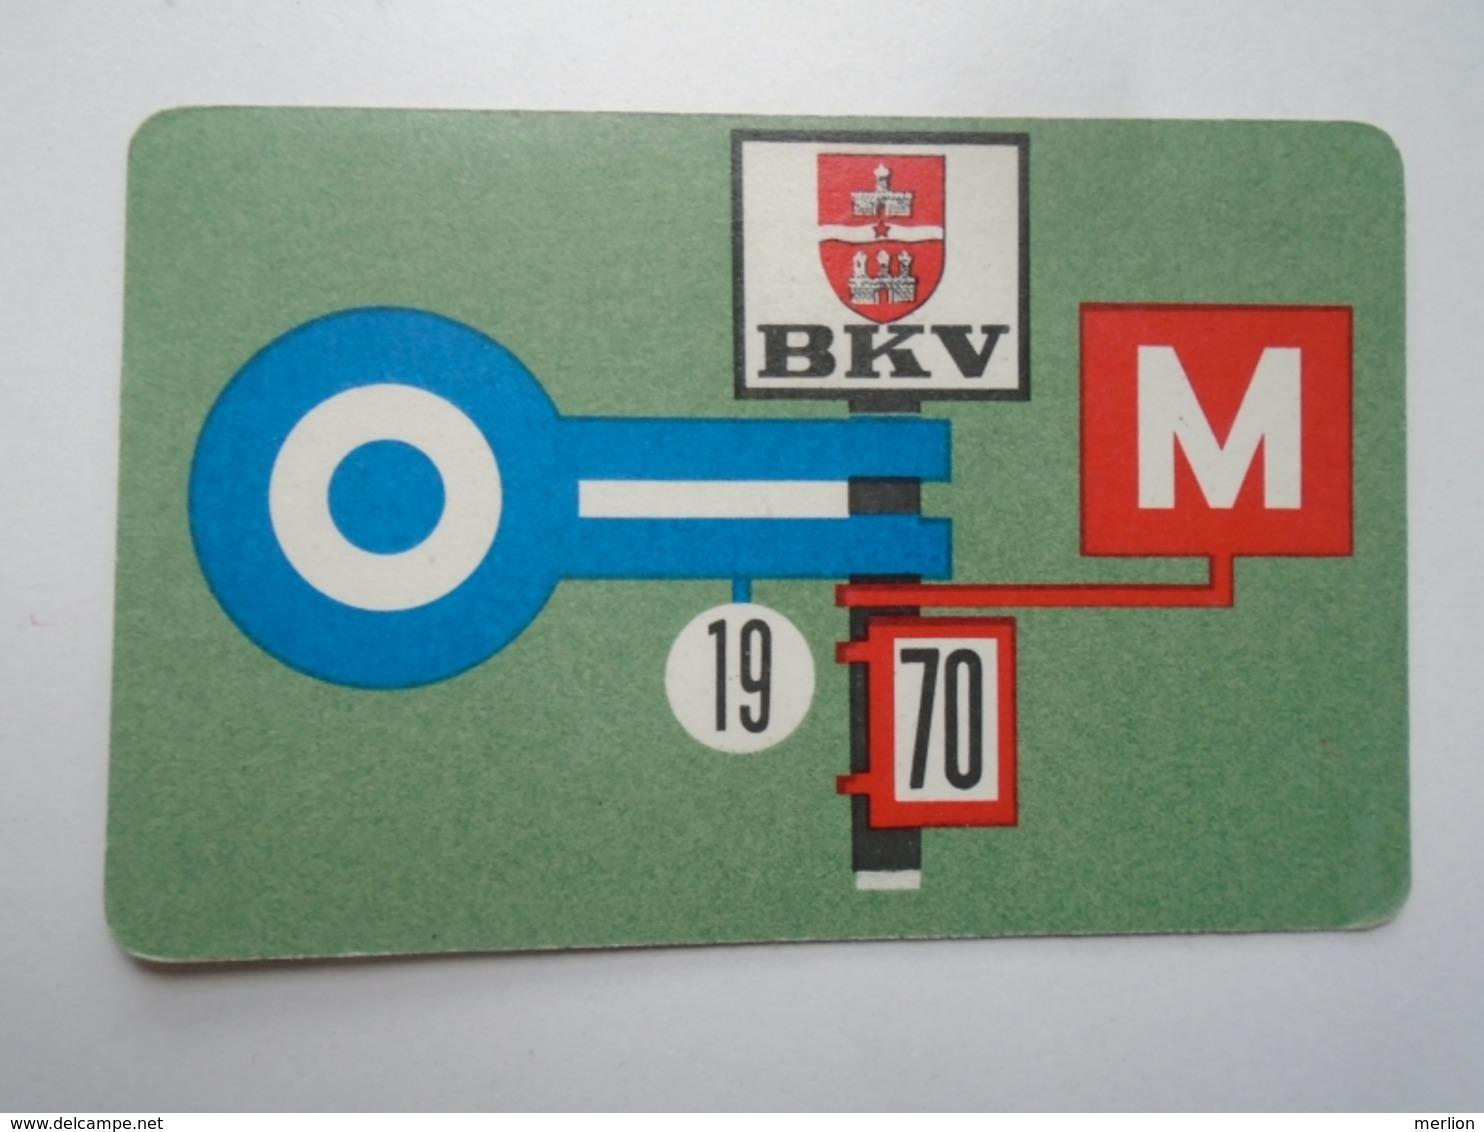 D156611 Hungary  - Local Transport Budapest  BKV Bus Tram Train Subway  - Pocket Calendar - Calendrier Poche 1970 - Petit Format : 1961-70